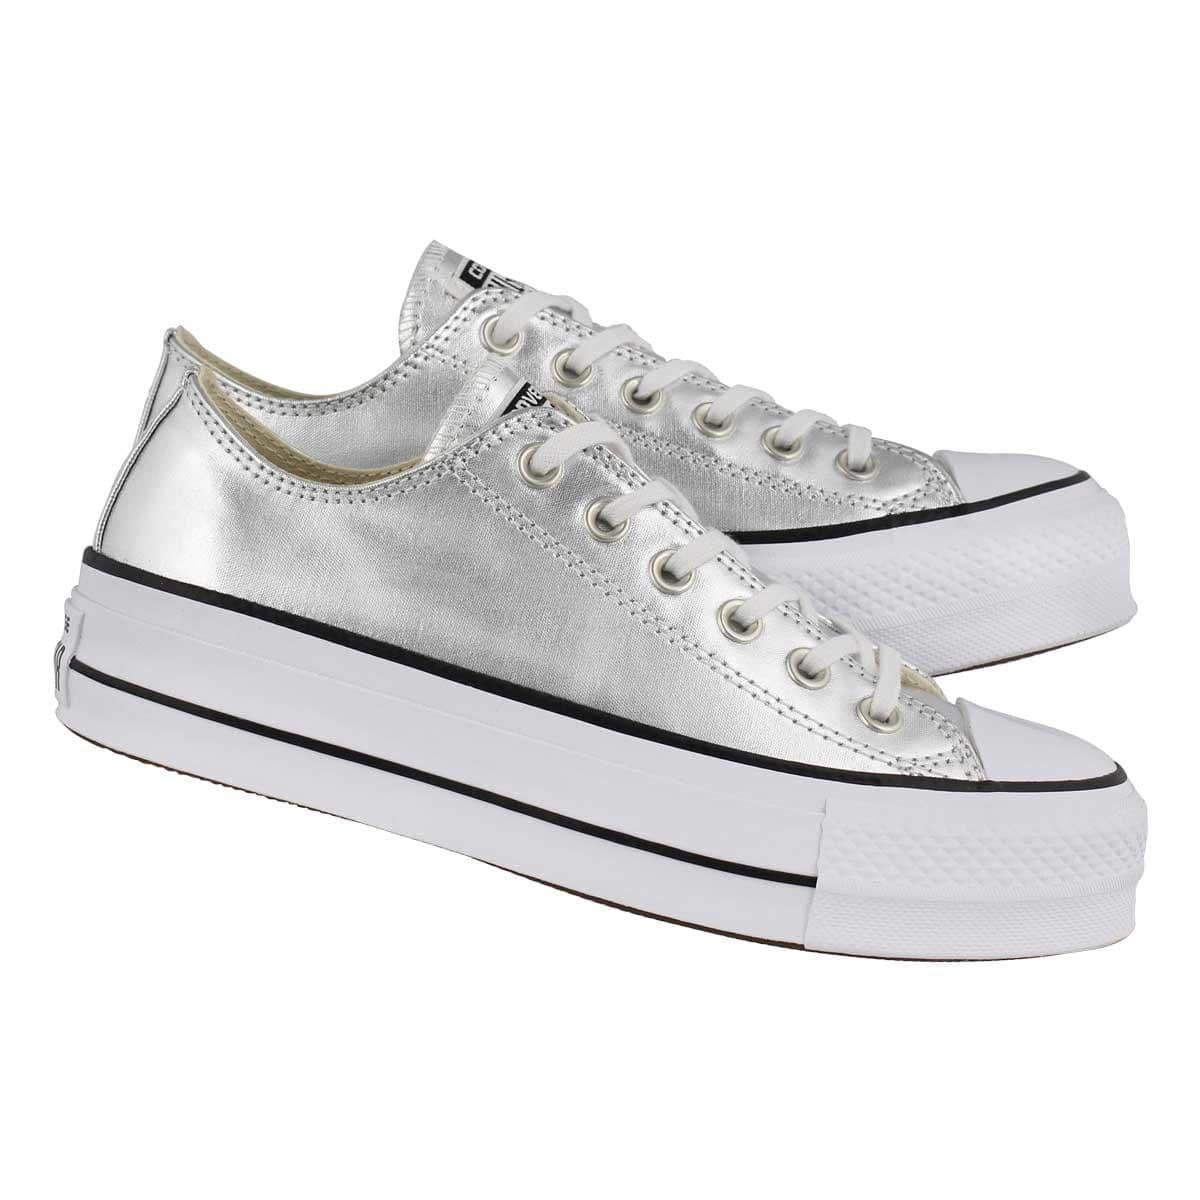 4d82a82b8b0 Silver Converse Platform heel Metallic Lift Low Top Club shoes w  Swarovski  Crystal Rhinestone Chuck Taylor All Star Wedding Bride Sneakers